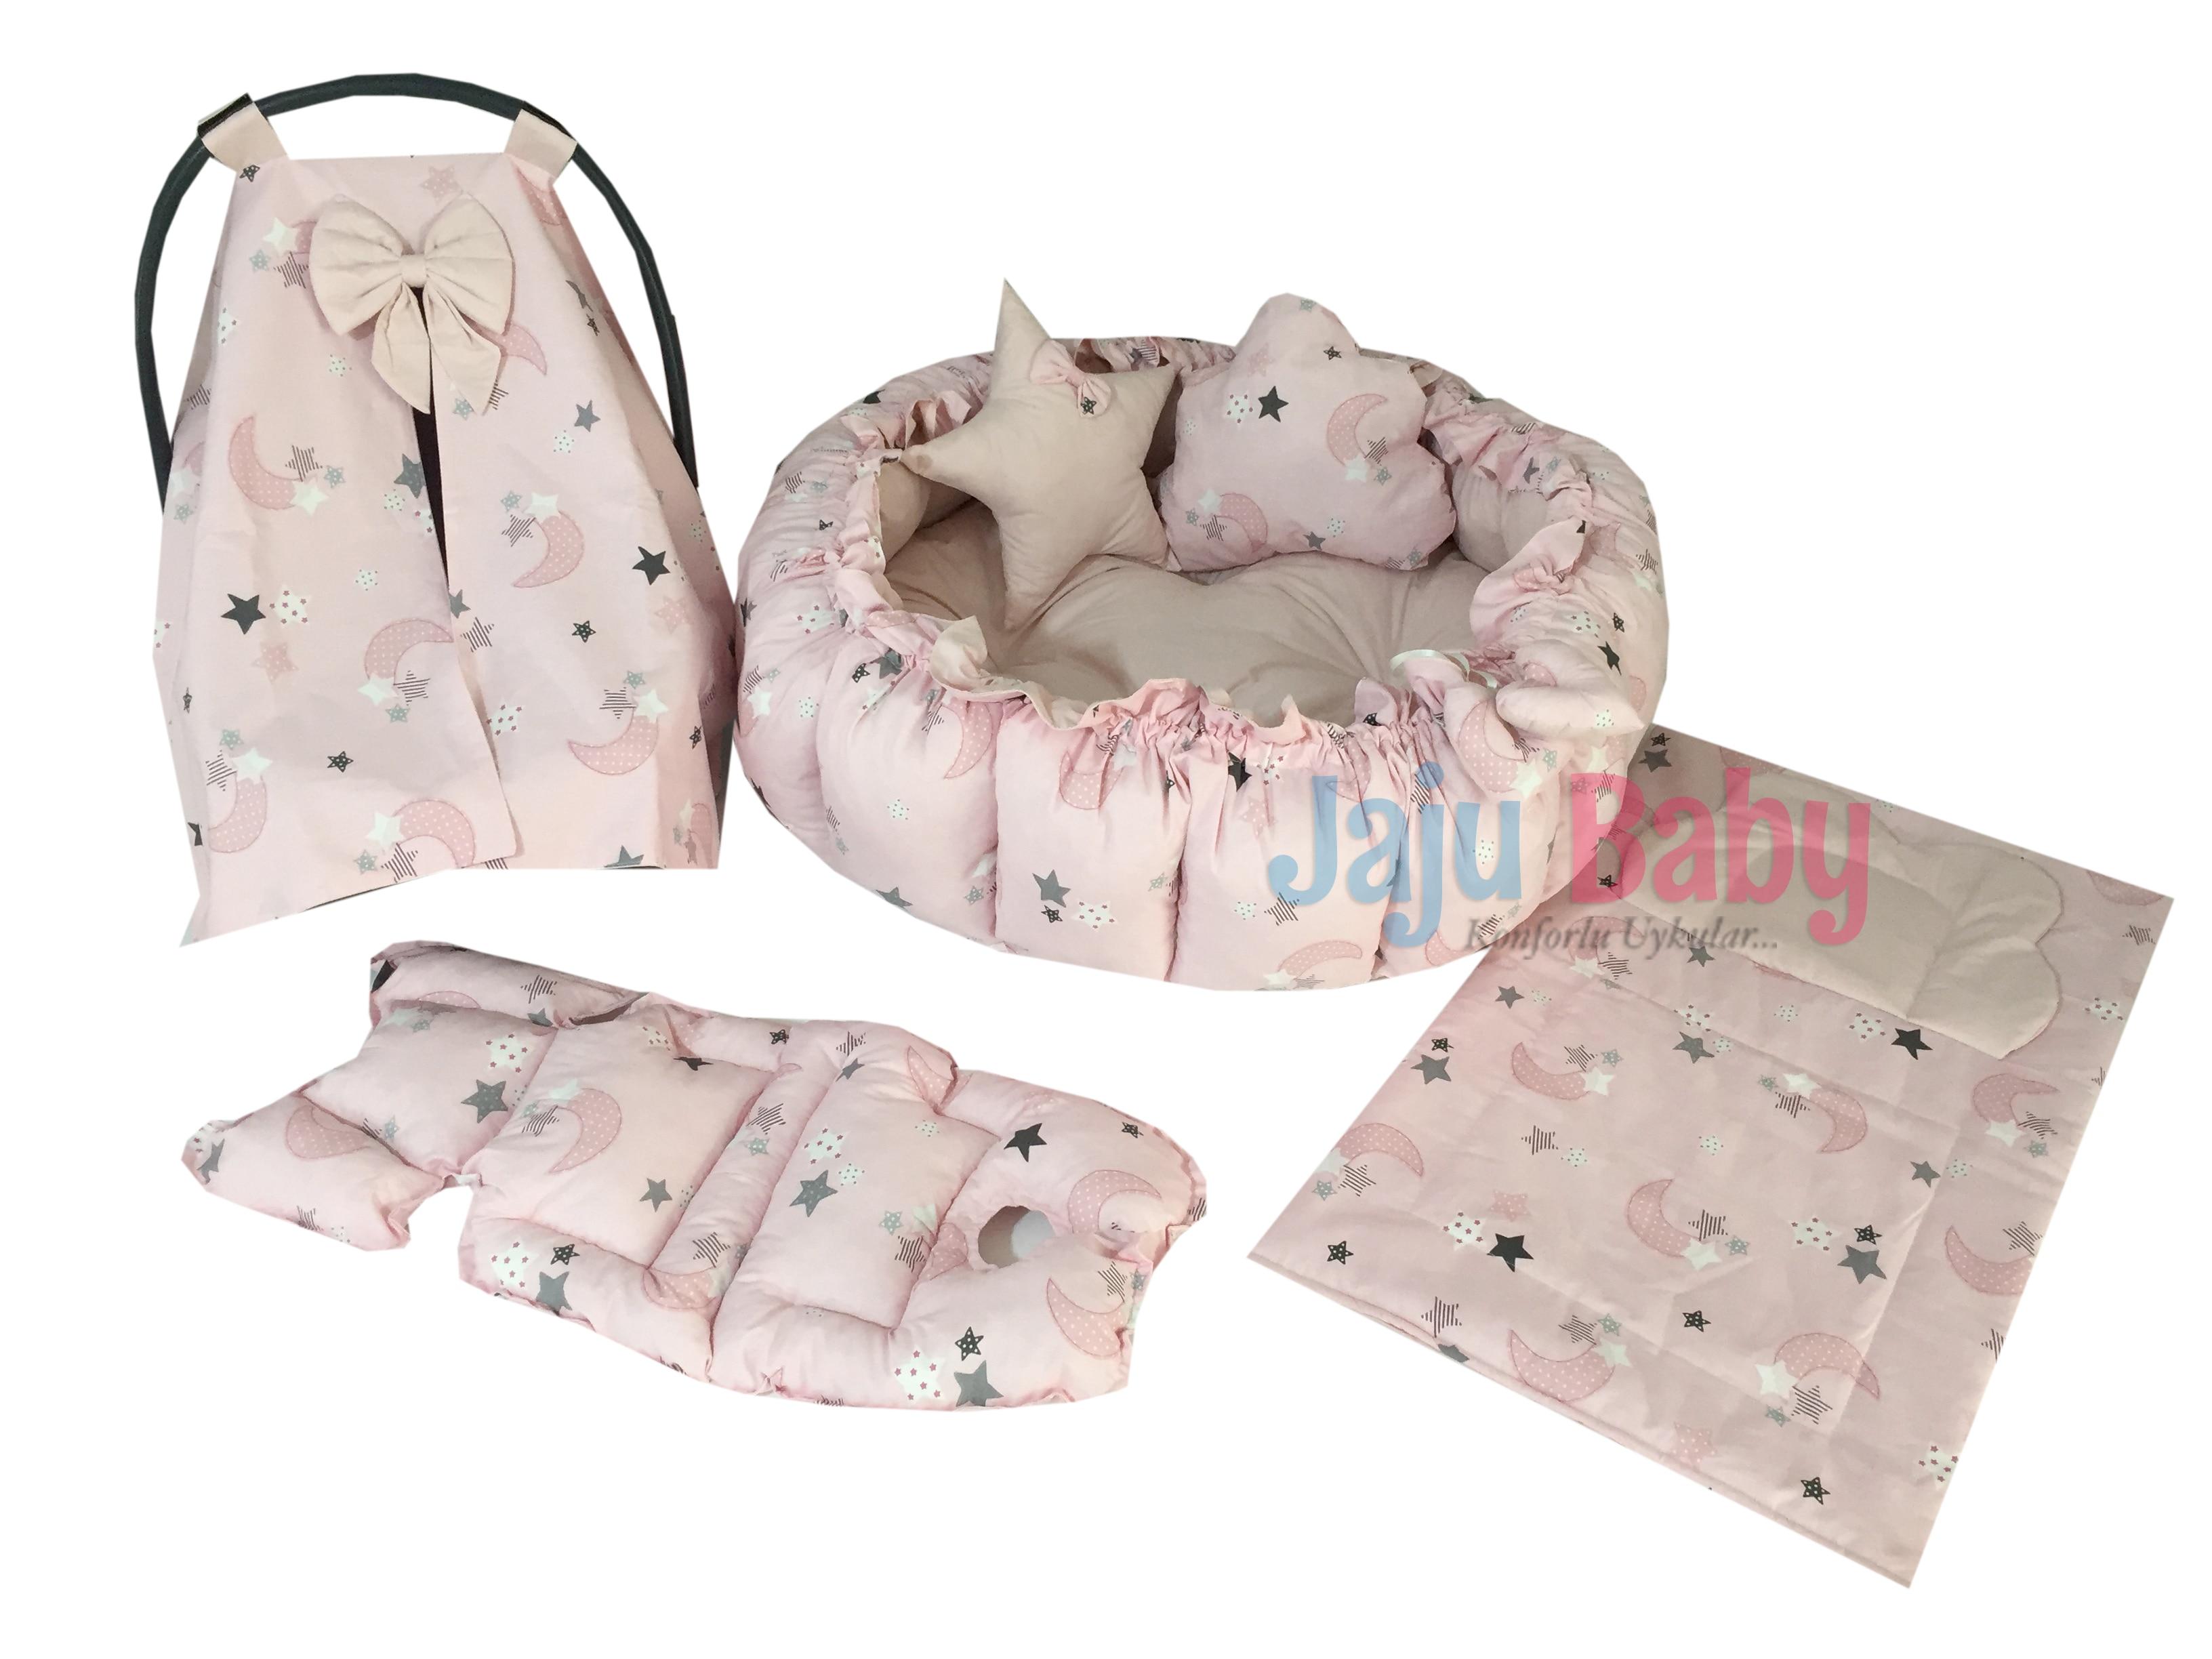 Jaju الطفل الوردي القمر نمط مجموعة تصميم فاخر تلعب حصيرة Babynest ، طوي مرتبة السرير للطفل ، Playmat ، فراش ، مرتبة السرير للطفل ،